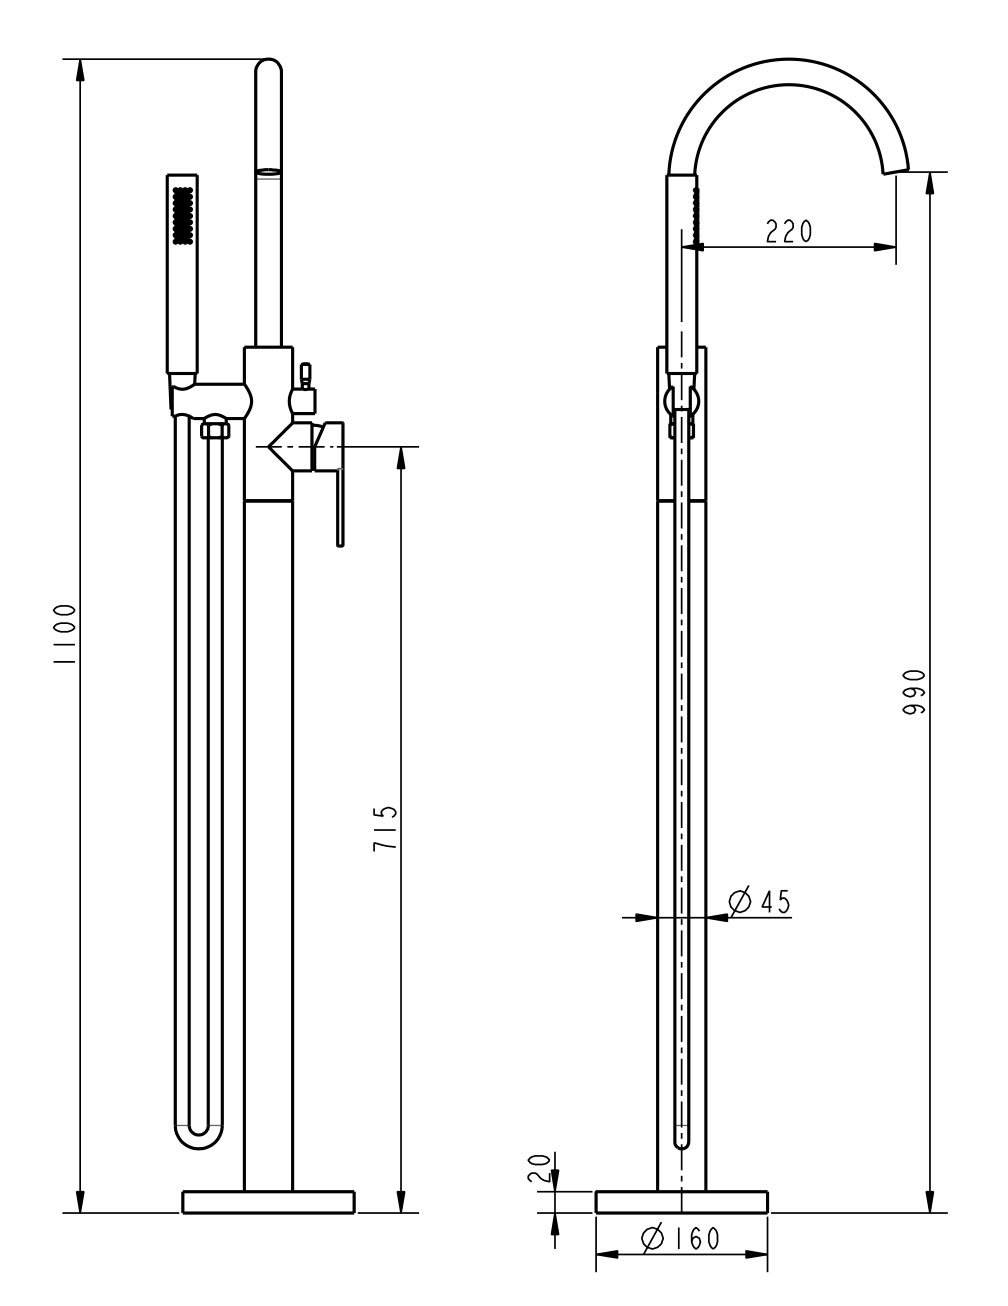 TECHNICAL DRAWING 1. schema-bain-douche-sol-louvre